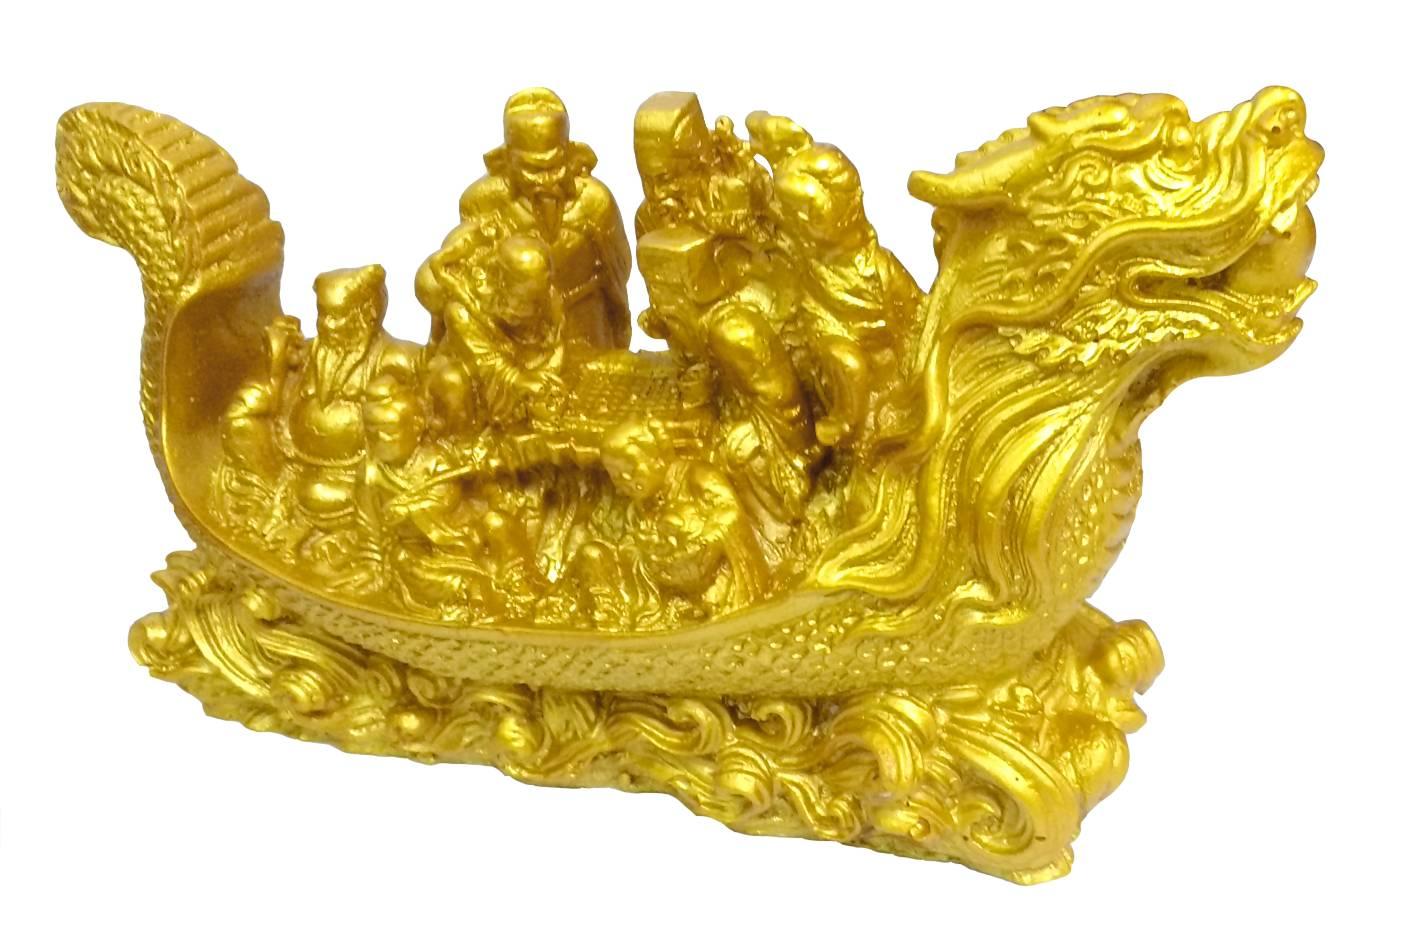 Dragon Wealth Ship, wealth Ship, Feng shui, Fengshui, Starstell Vastu Feng Shui Dragon Wealth Ship Polyresin Showpiece for Trade & Business Benefits